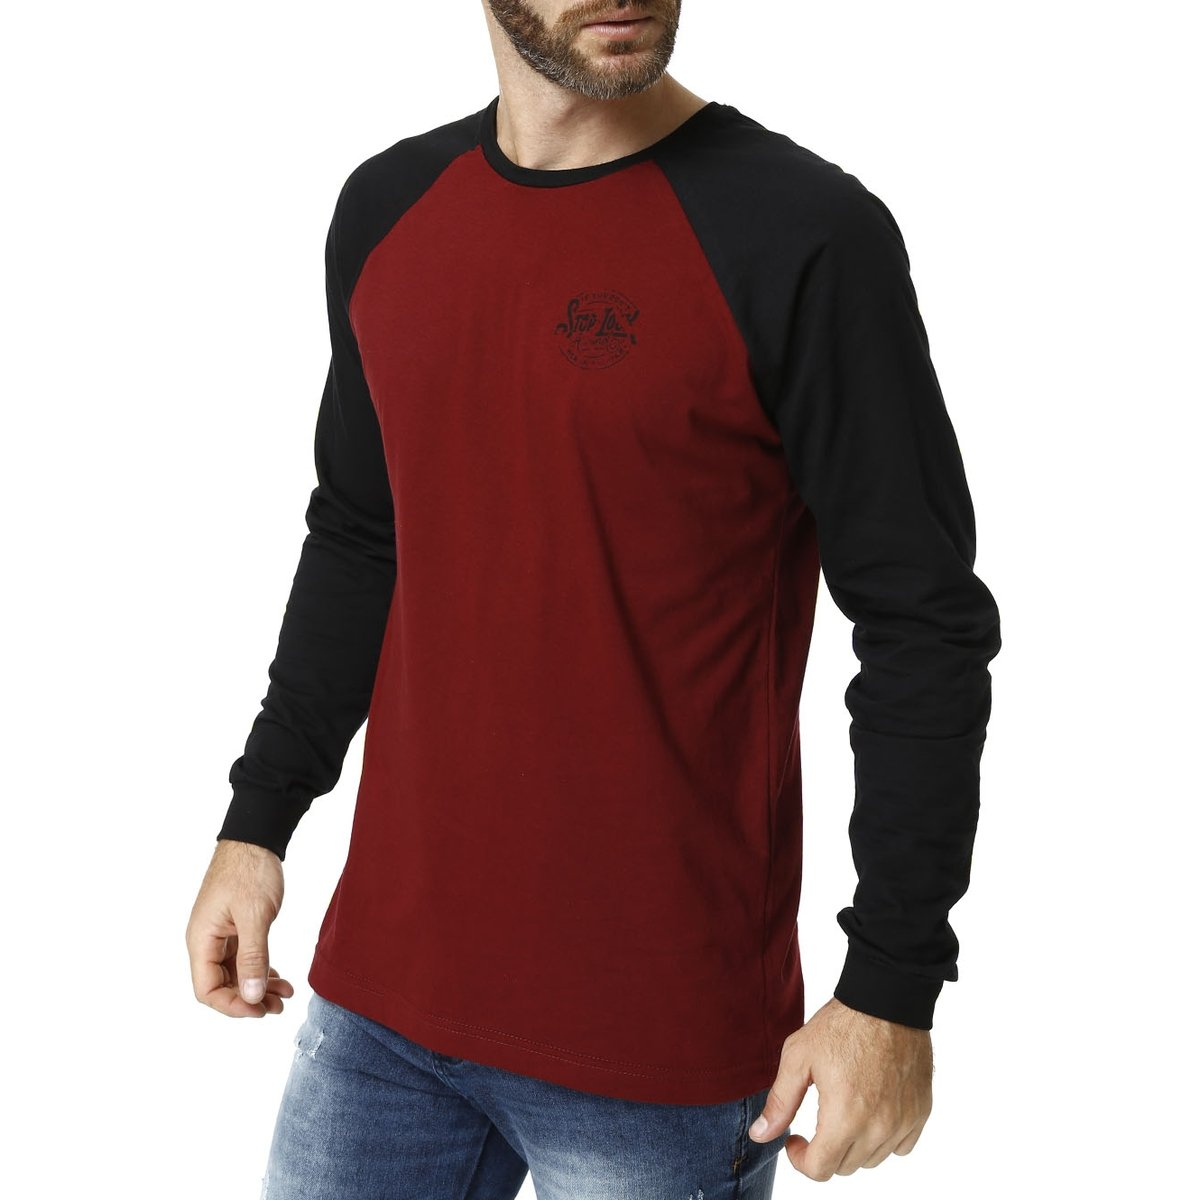 Camiseta Manga Longa Masculina - Compre Agora  136b1c47fe2